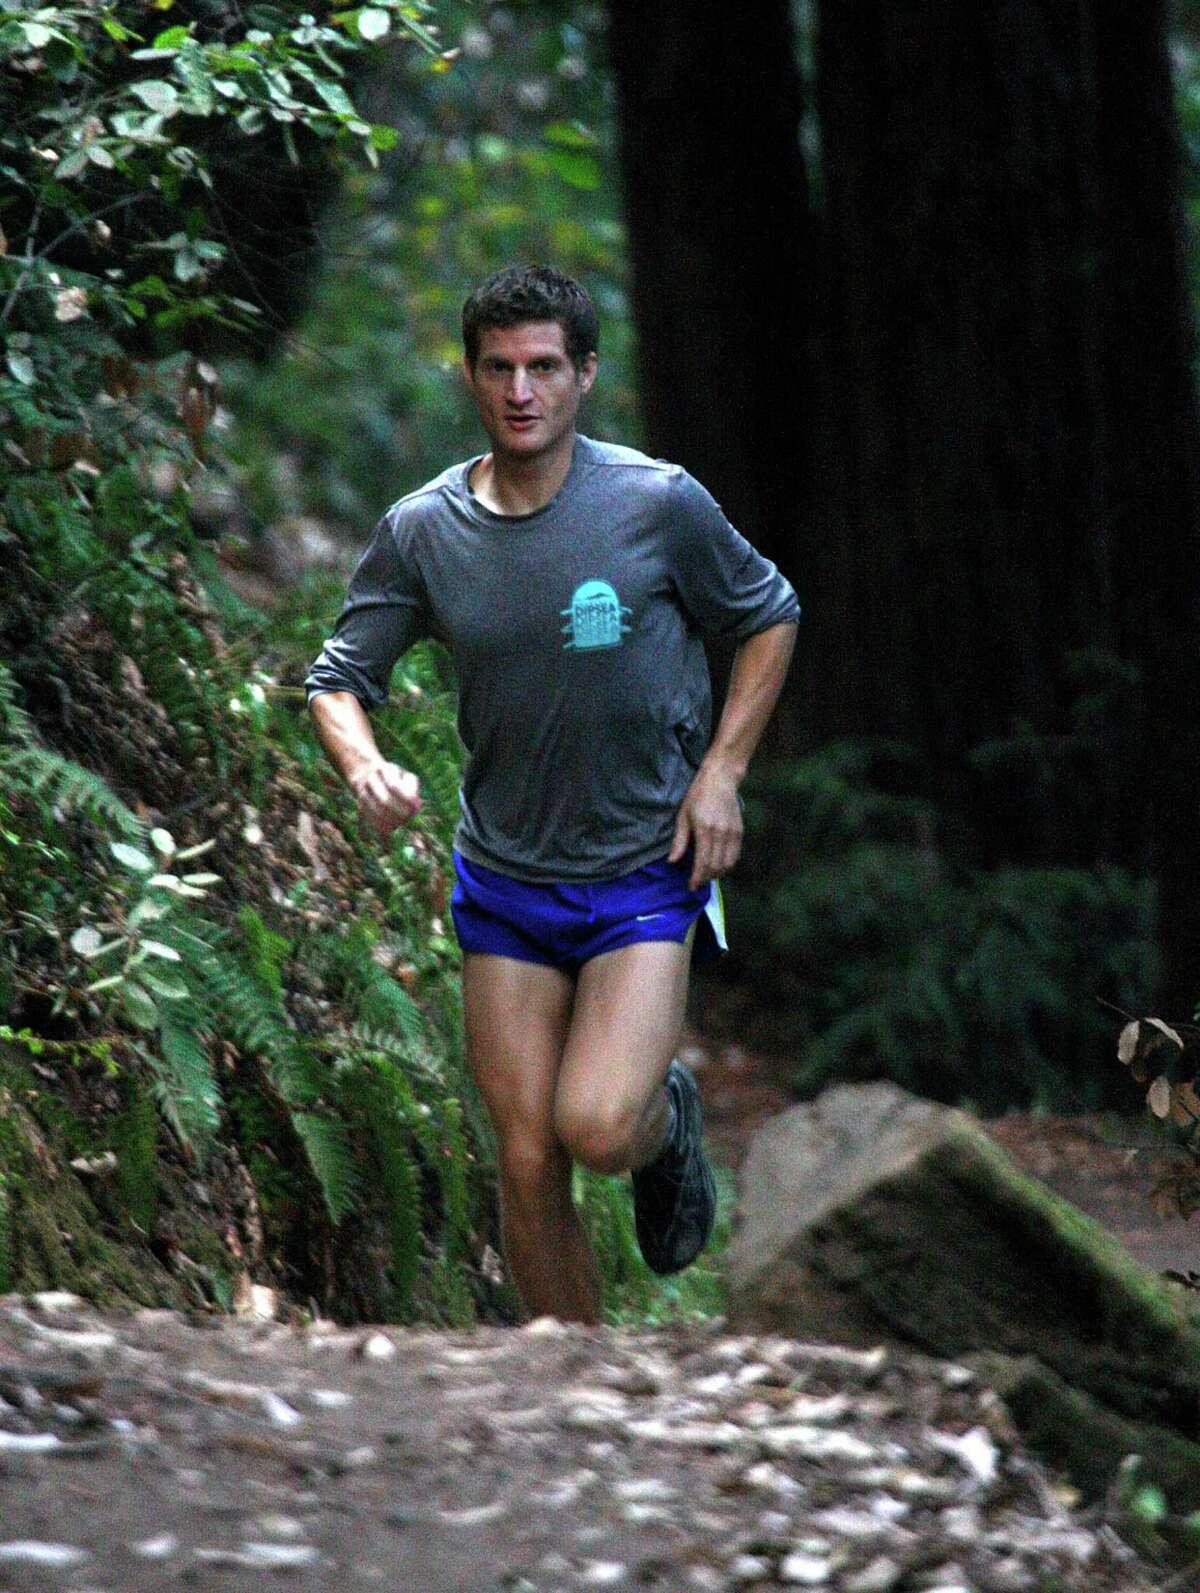 Leor Pantilat, a corporate lawyer in Palo Alto, runs in Woodside's Huddart Park, a favorite trail near his San Carlos home.